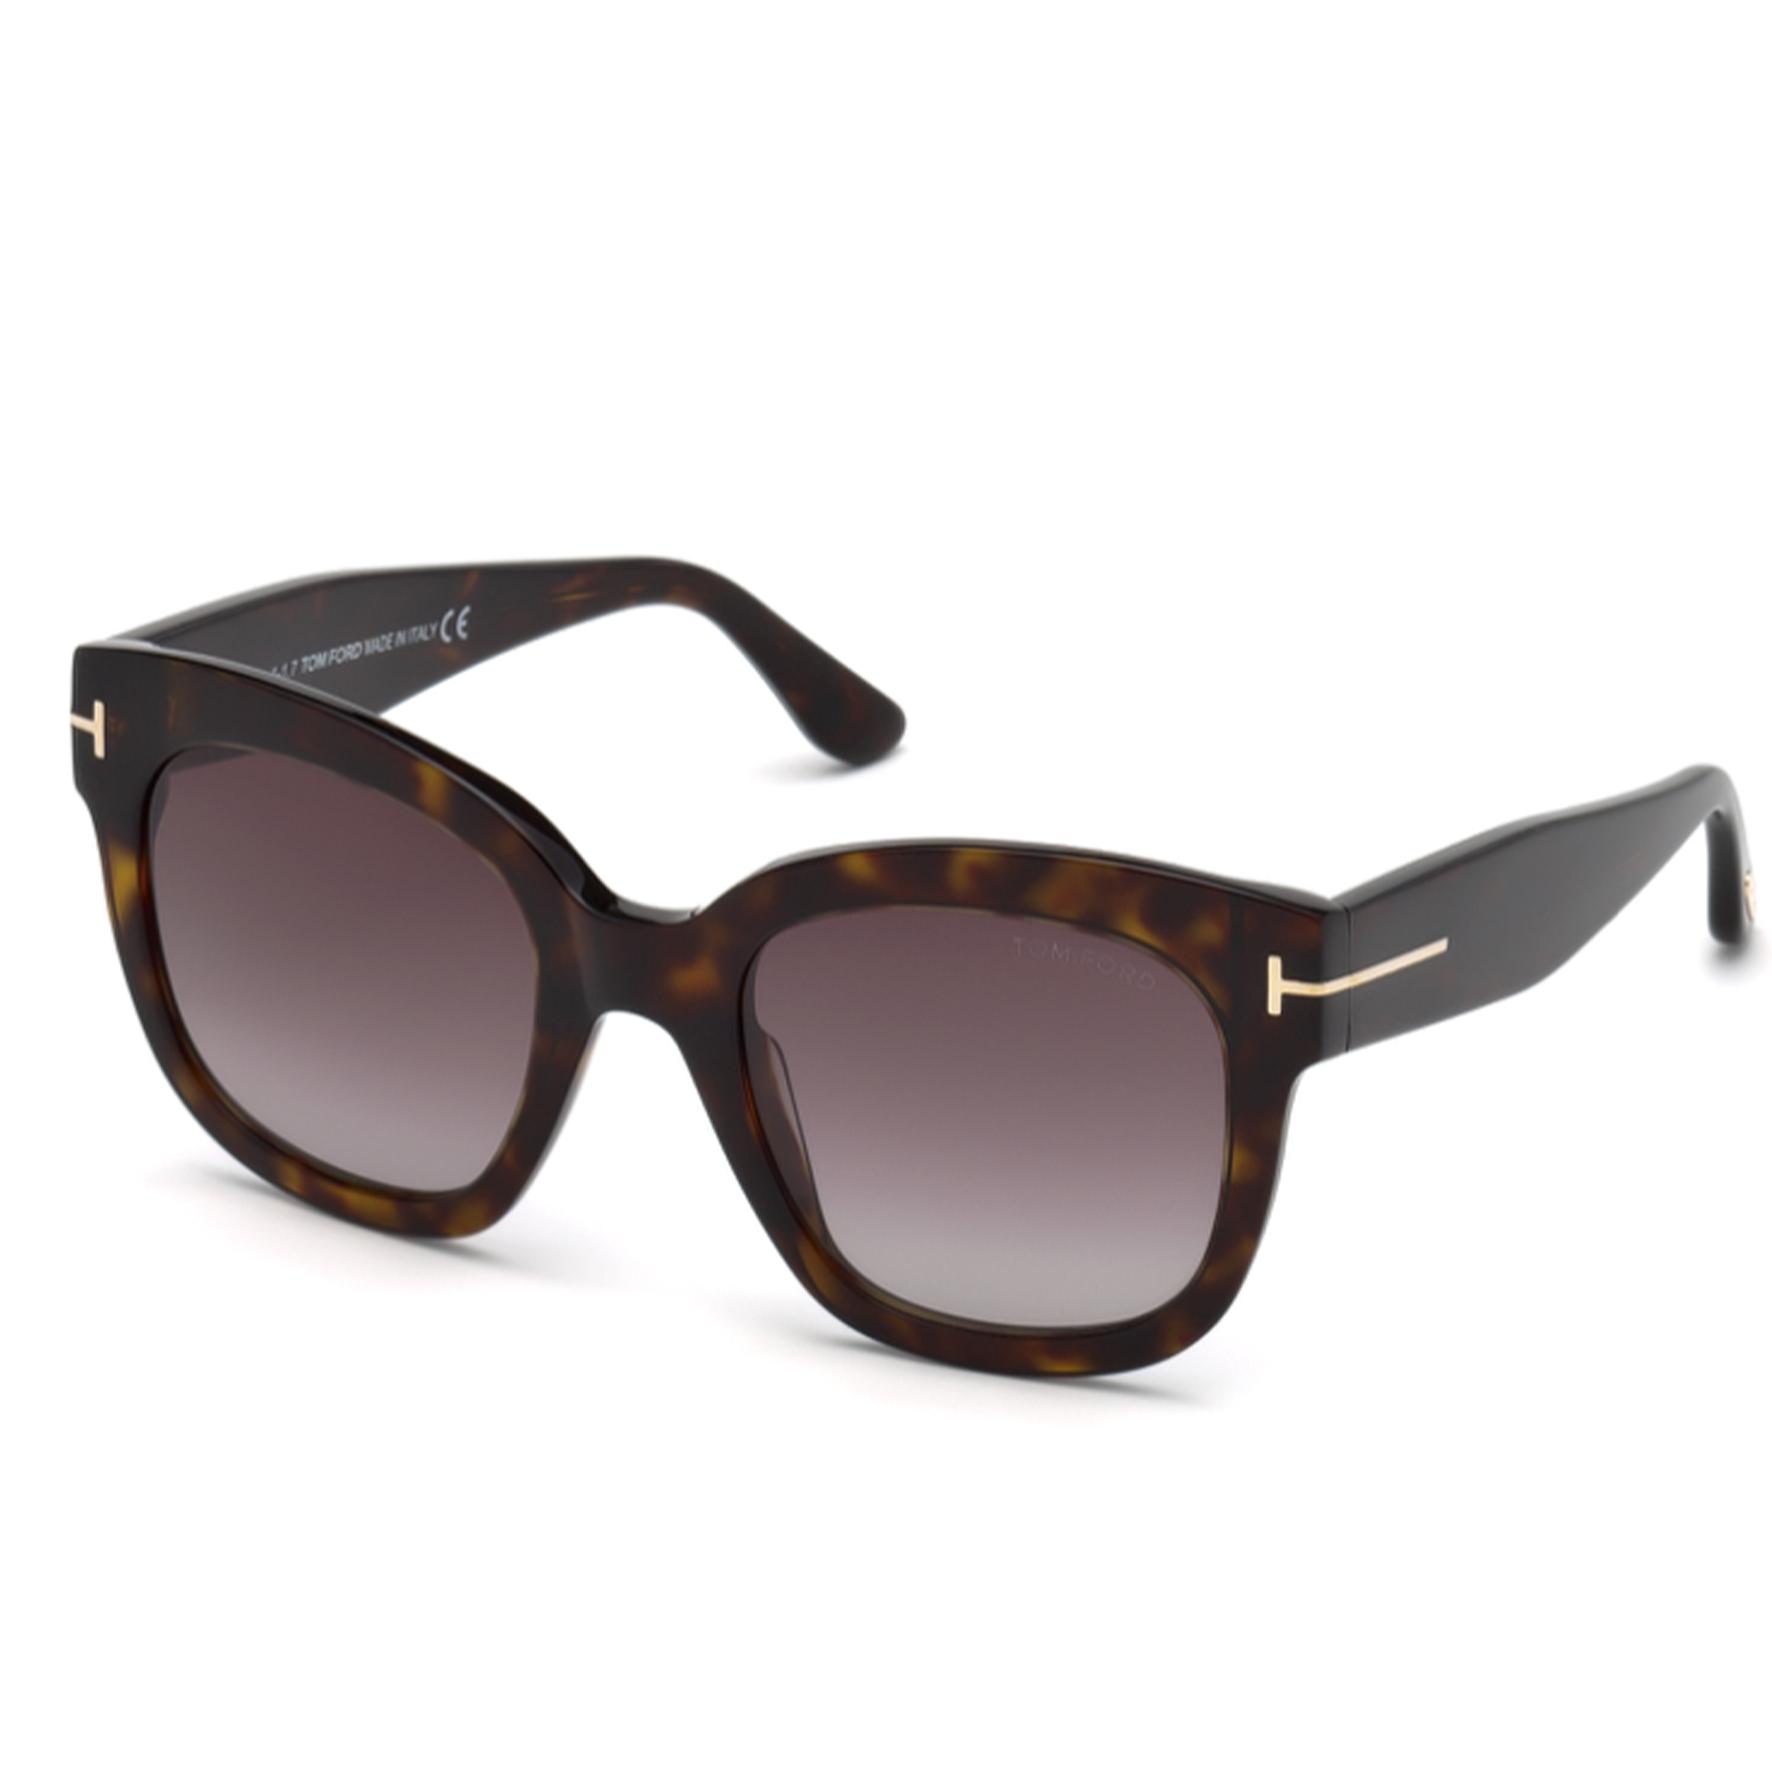 Tom Ford solglasögon - Atelier Vallgatan 7313c31ddb3df